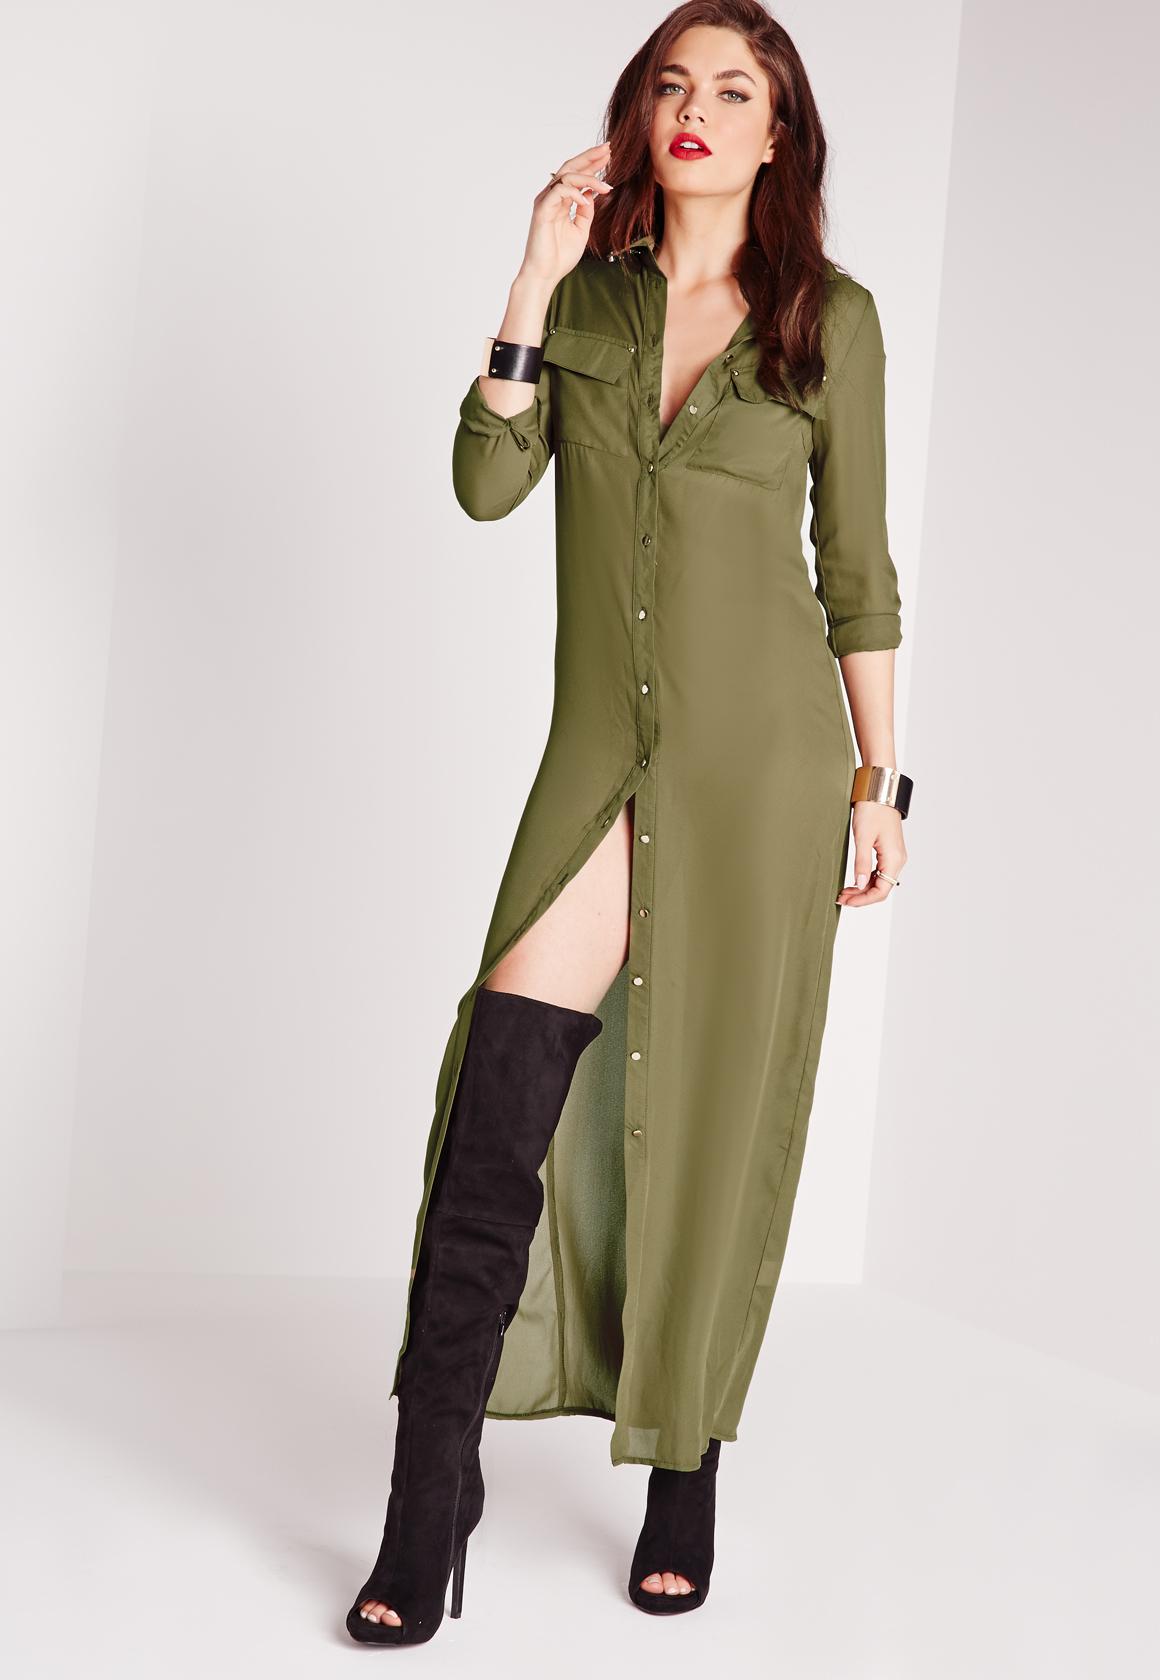 Maxi Length Long Sleeve Shirt Dress Khaki